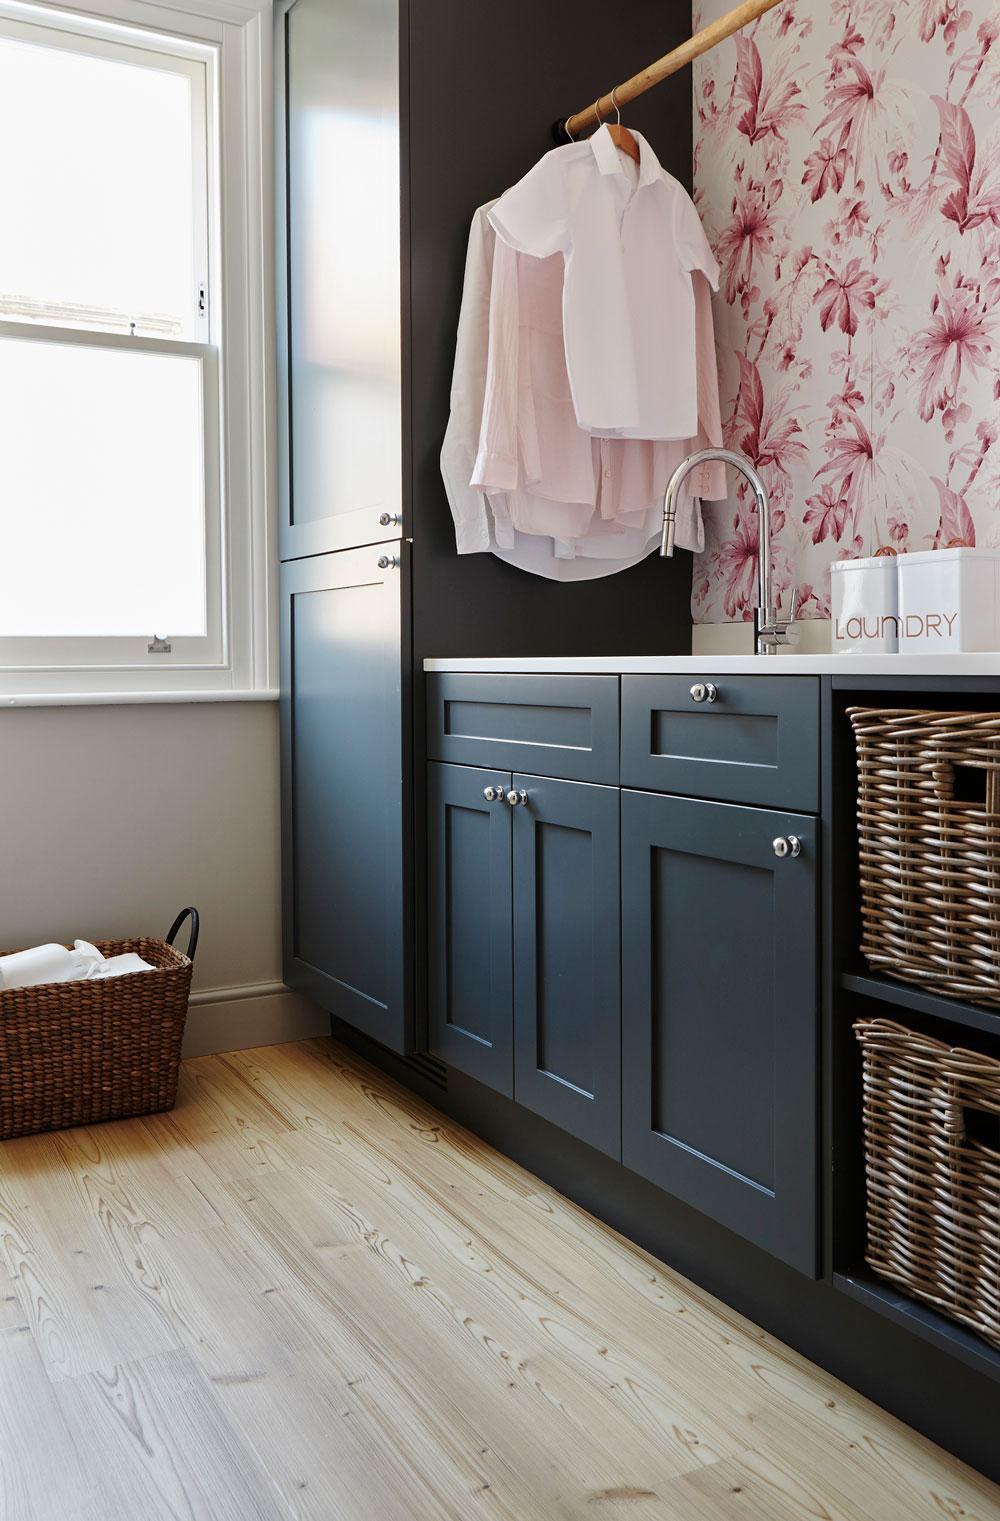 35 Chic Laundry Room Ideas Plus Utility Room Boot Room Inspiration Livingetc